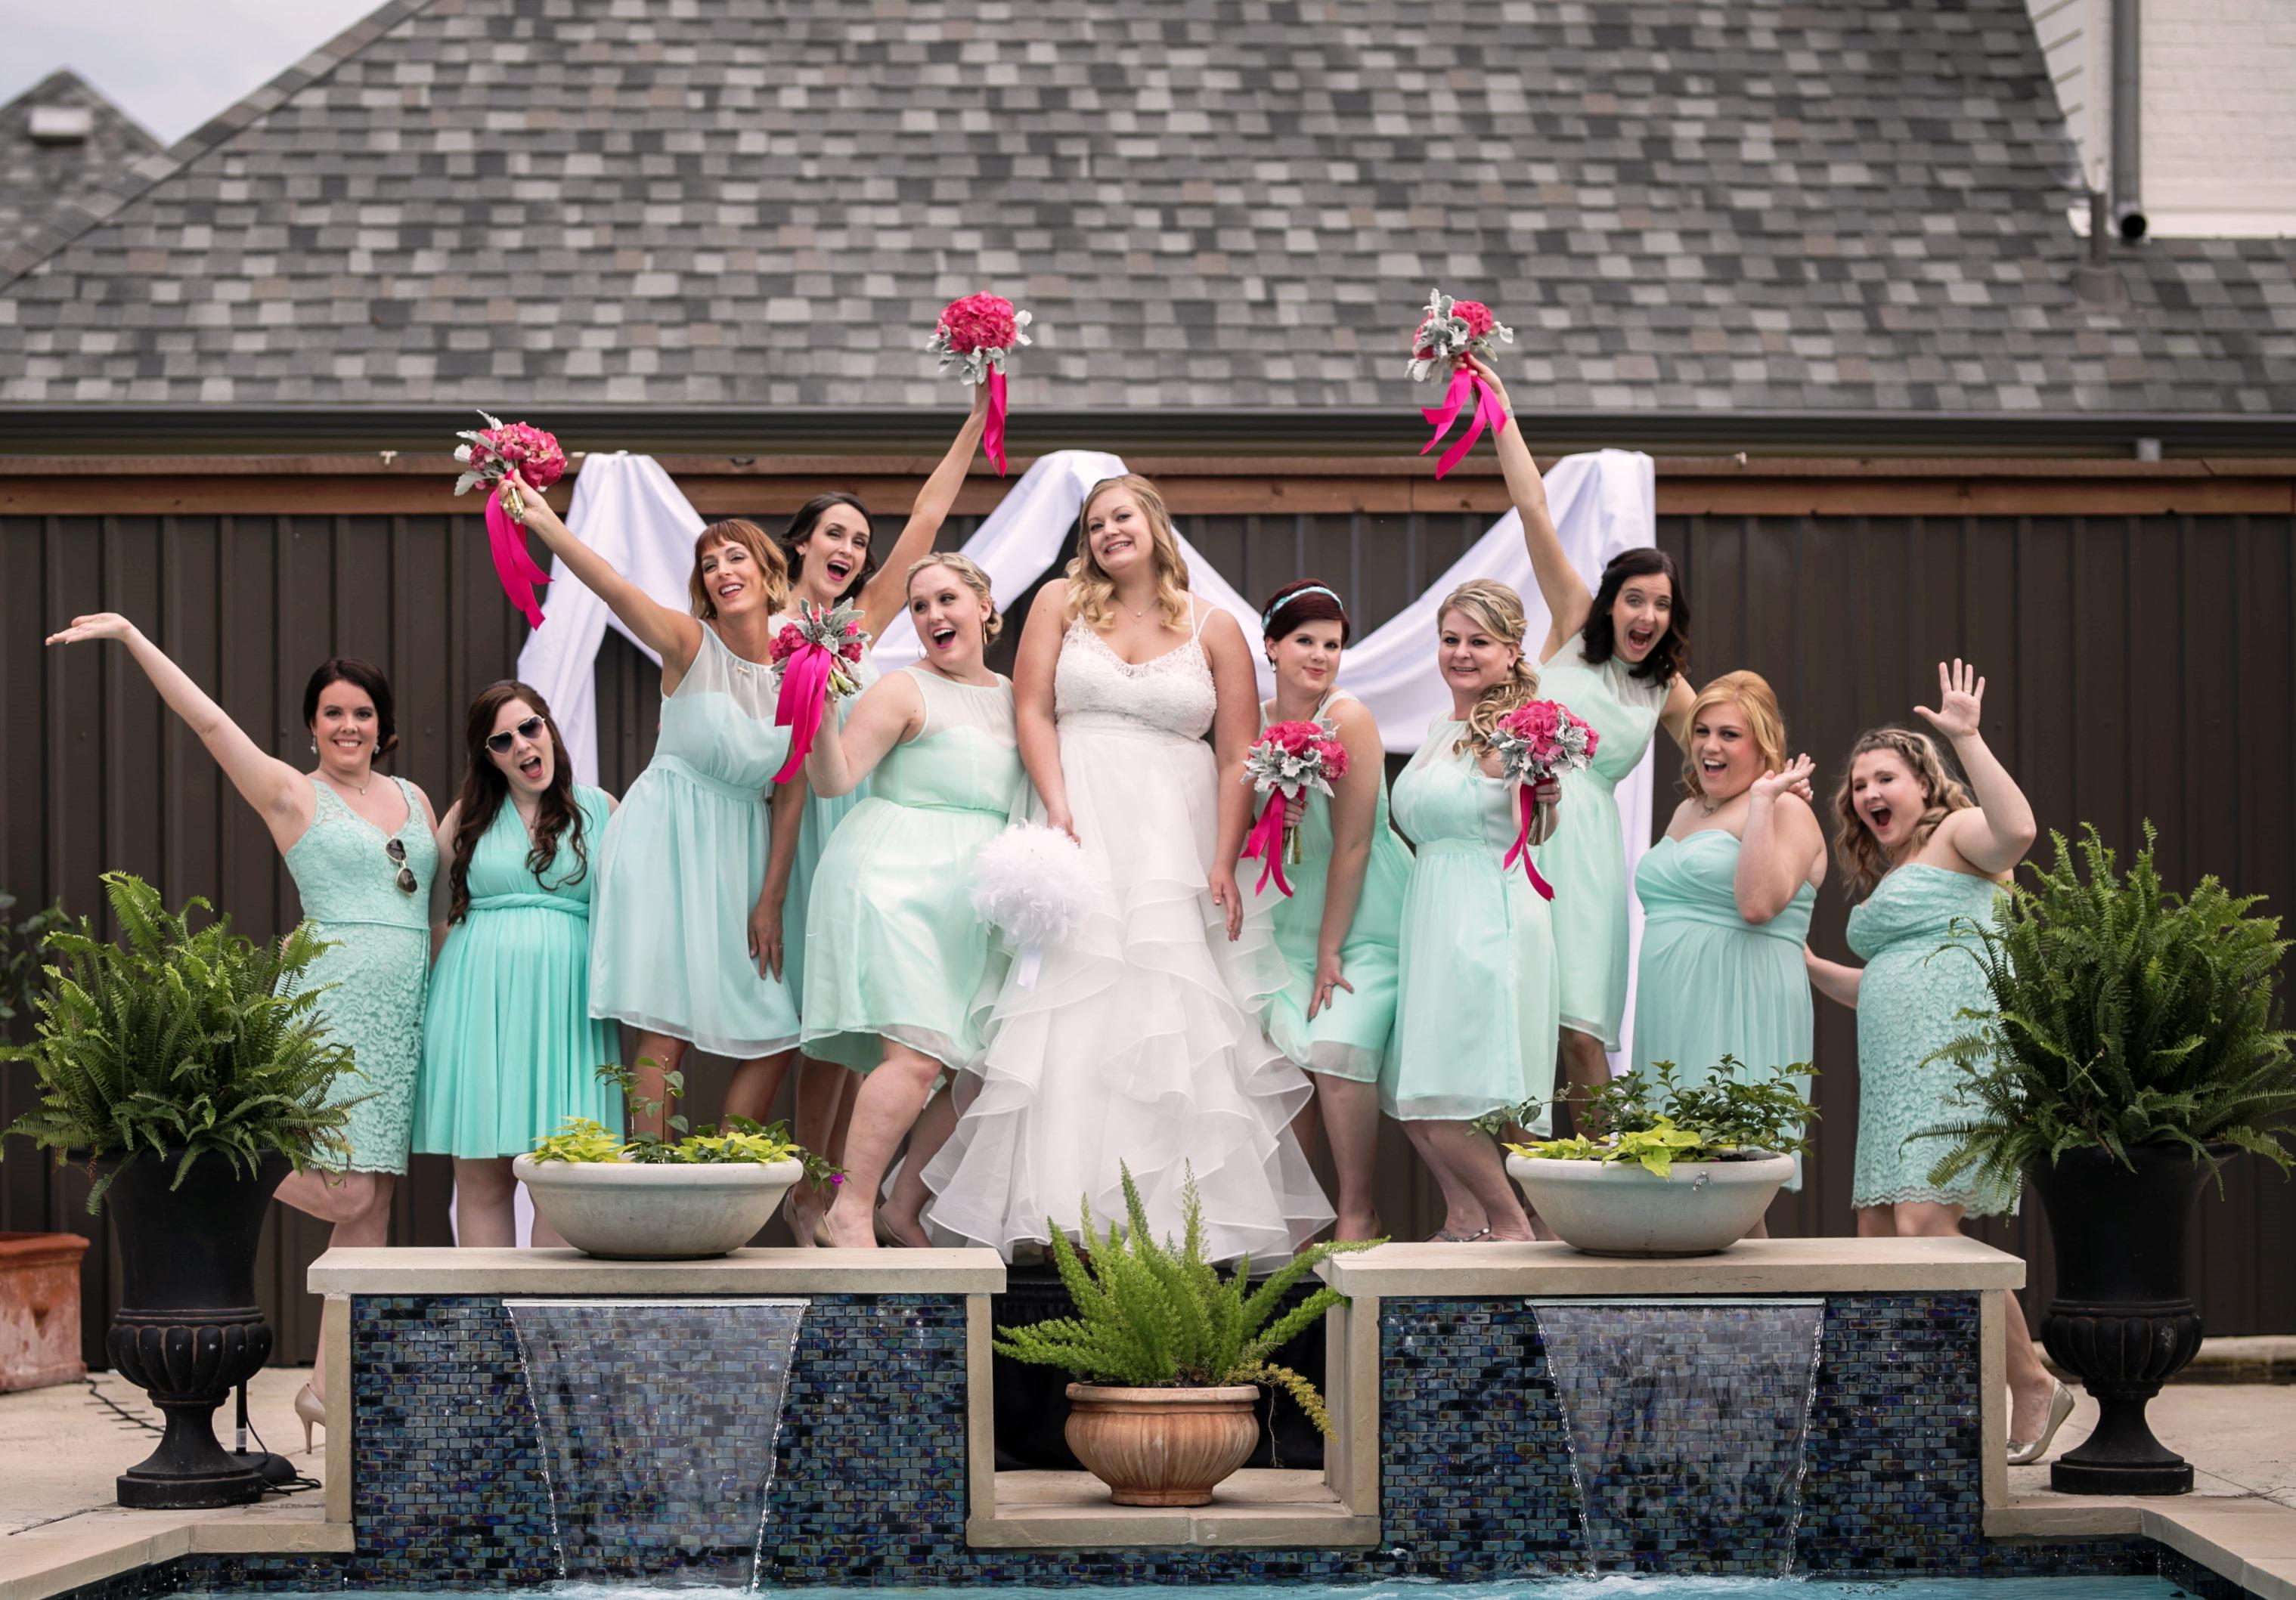 WEDDING PARTY PICS SUSAN_84-4